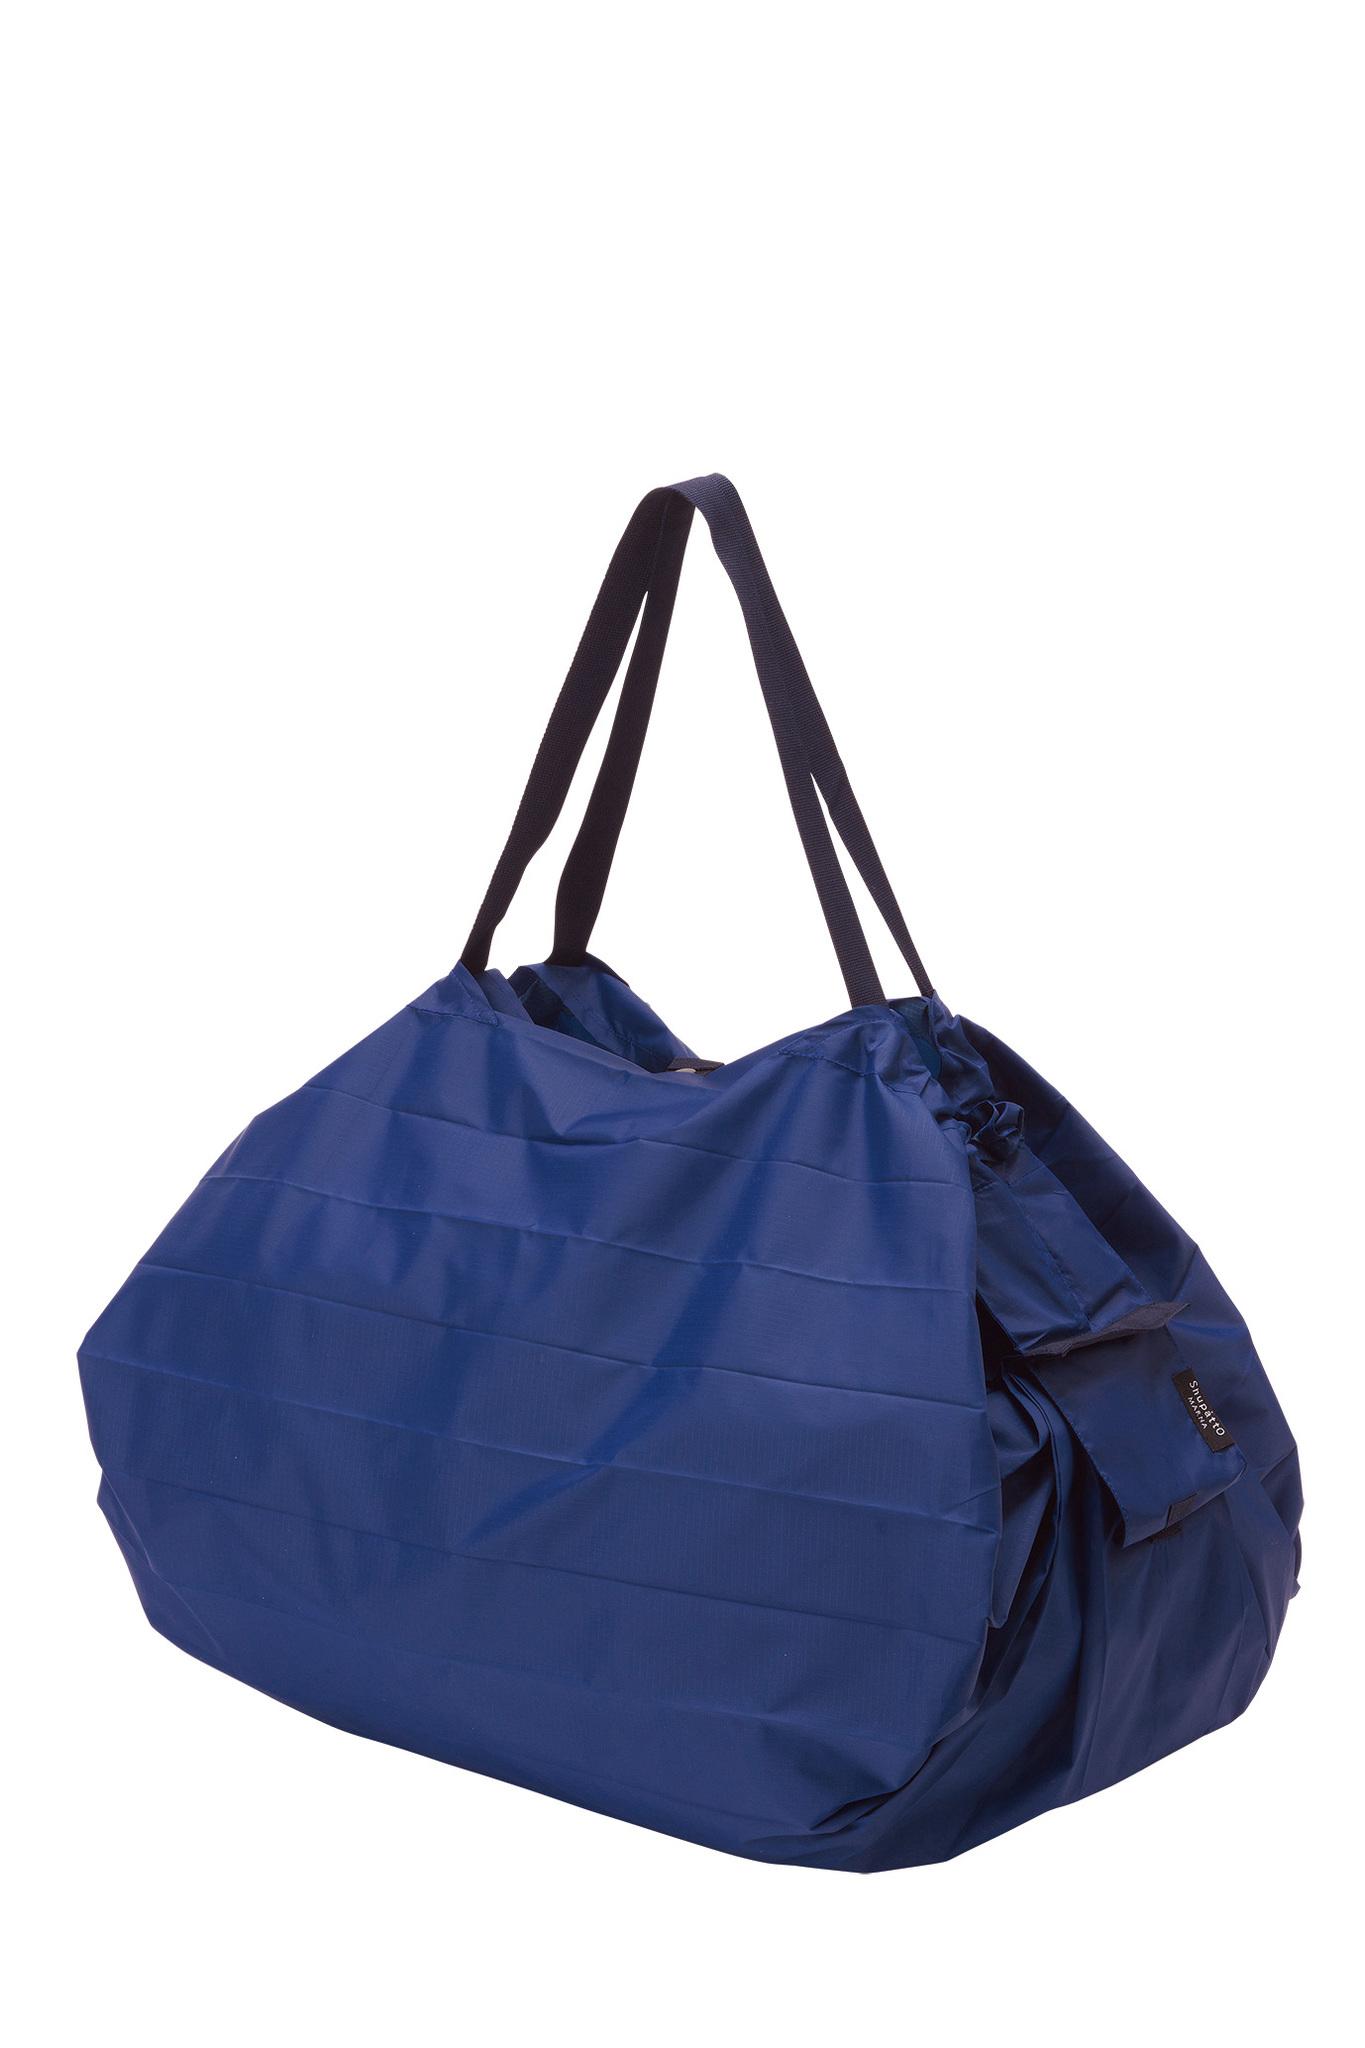 YORU (Night), Blau, Gröss L - gefaltet 10x6.5 cm ,